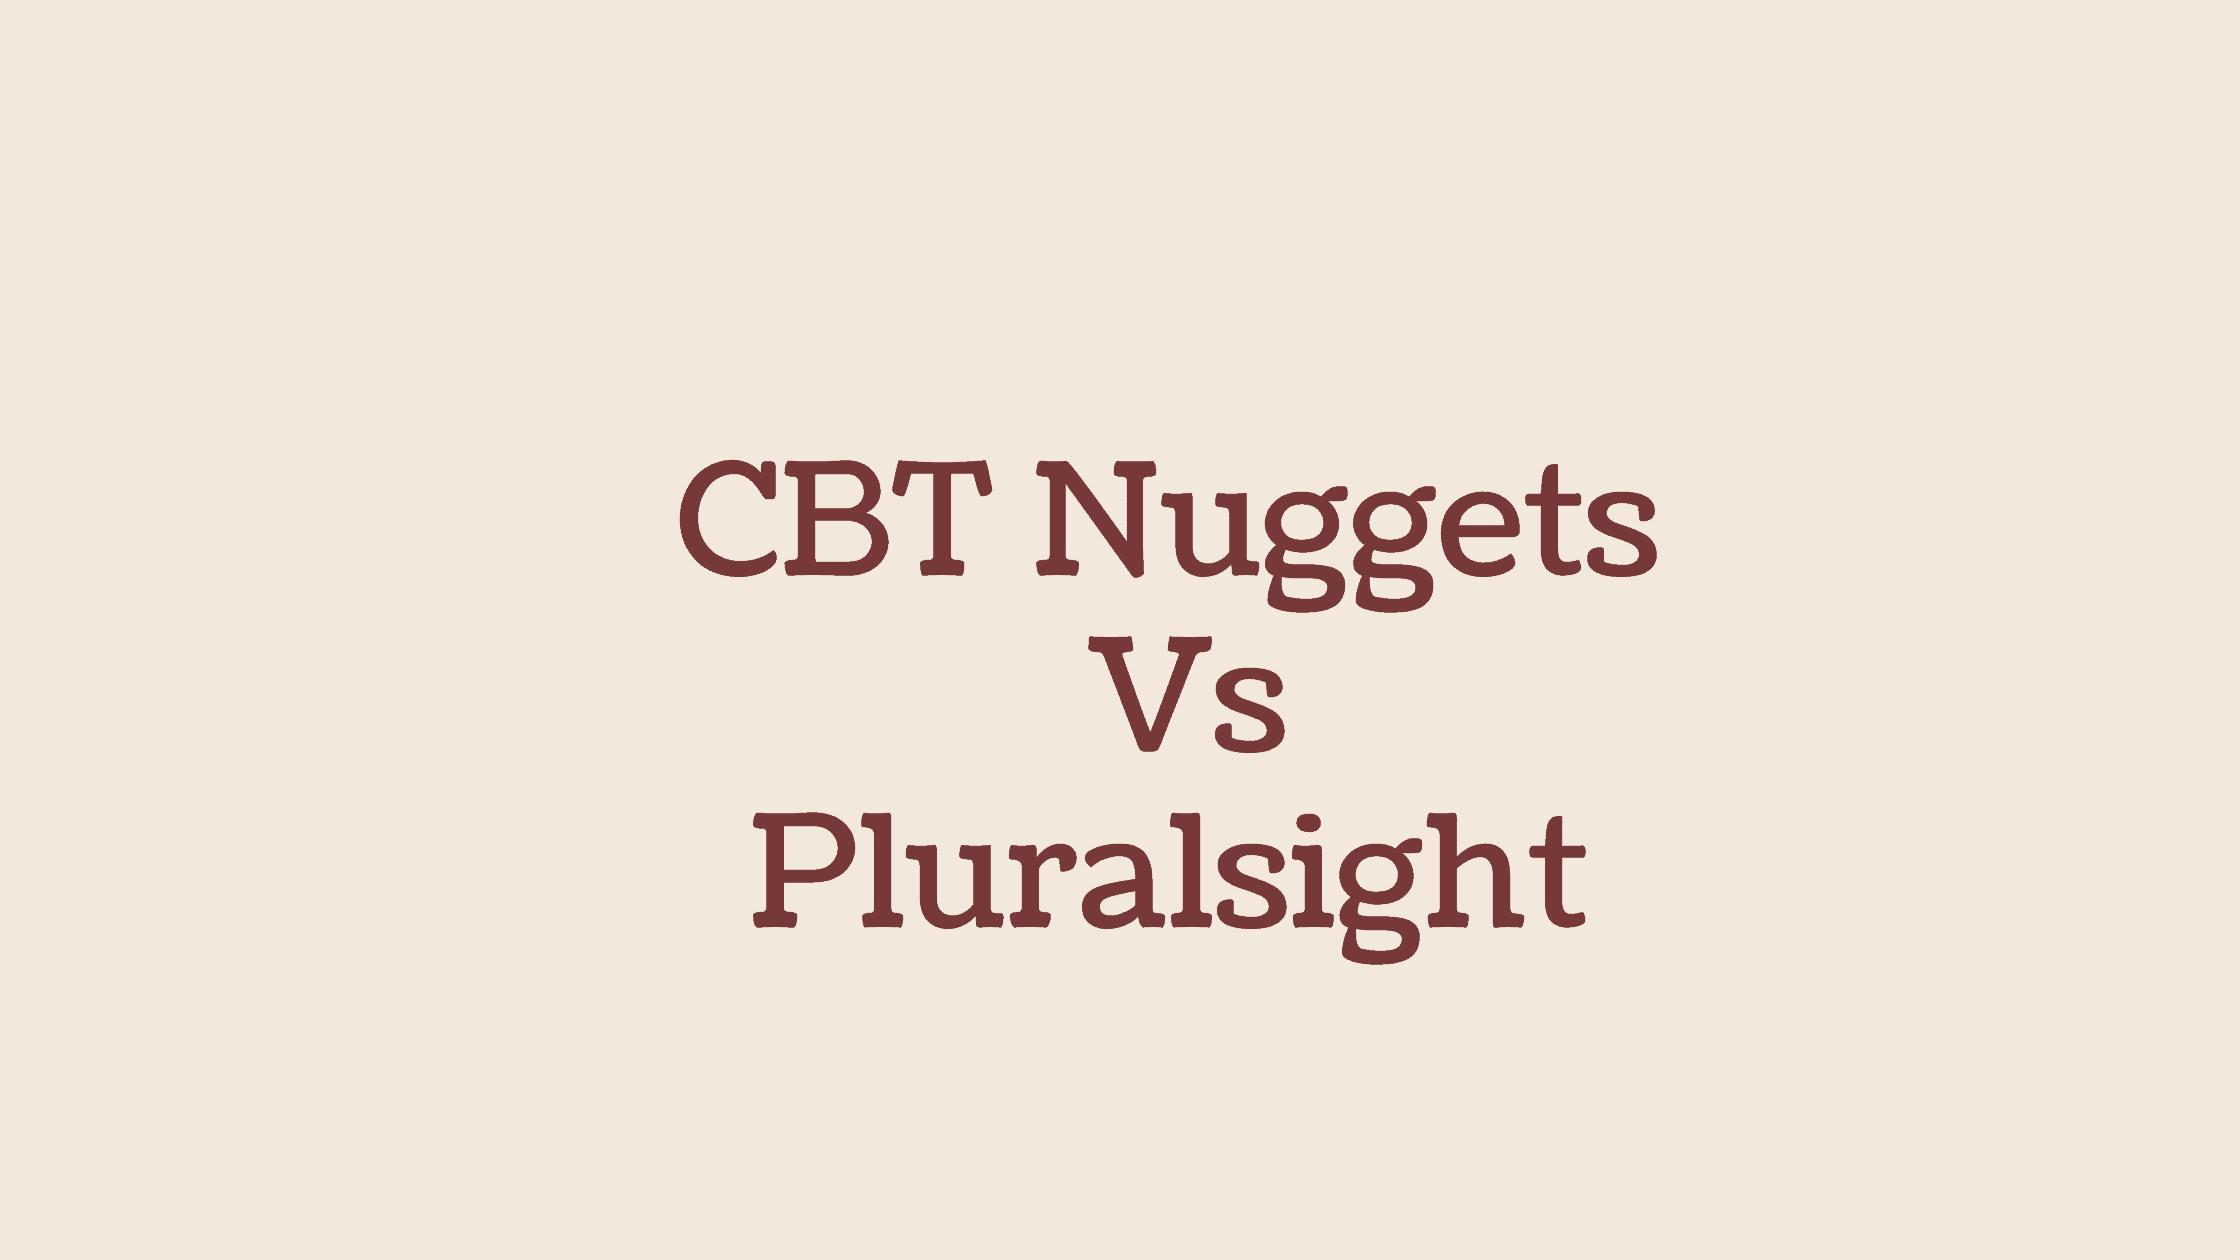 CBT Nuggets Vs Pluralsight